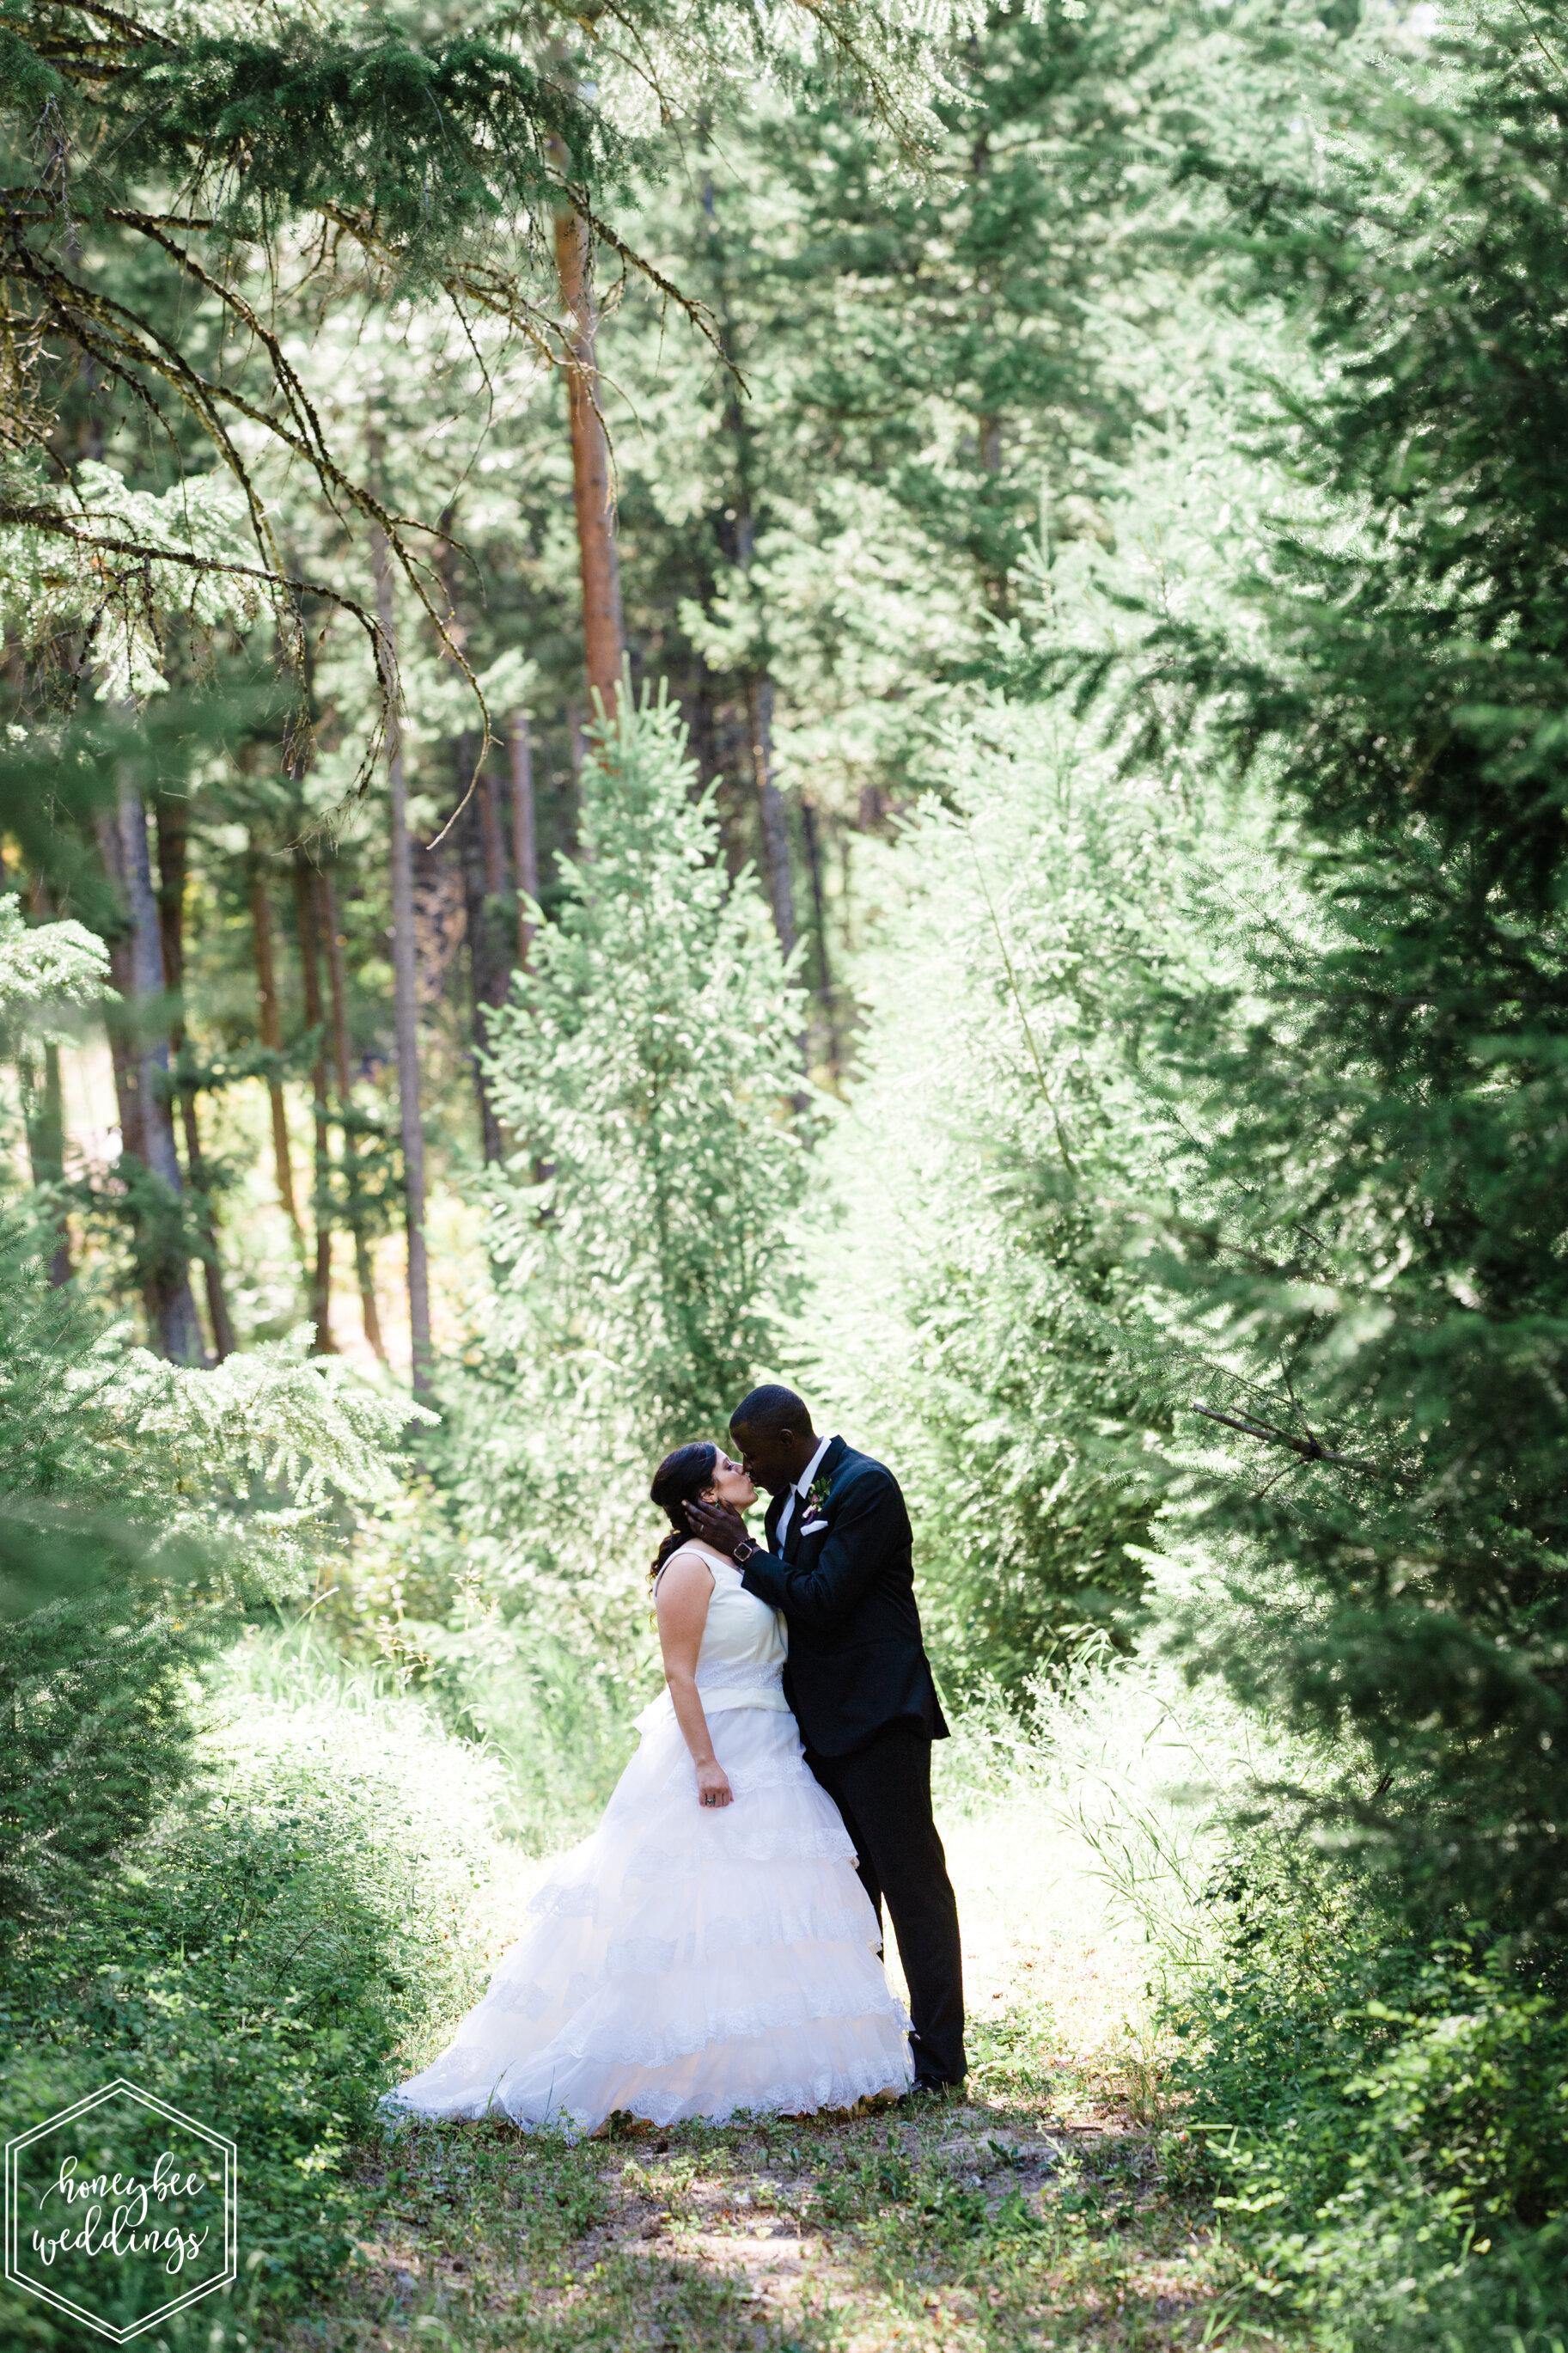 105White Raven Wedding_Montana Wedding Photographer_Rebekah & Likom_Honeybee Weddings_July 27, 2019-38.jpg